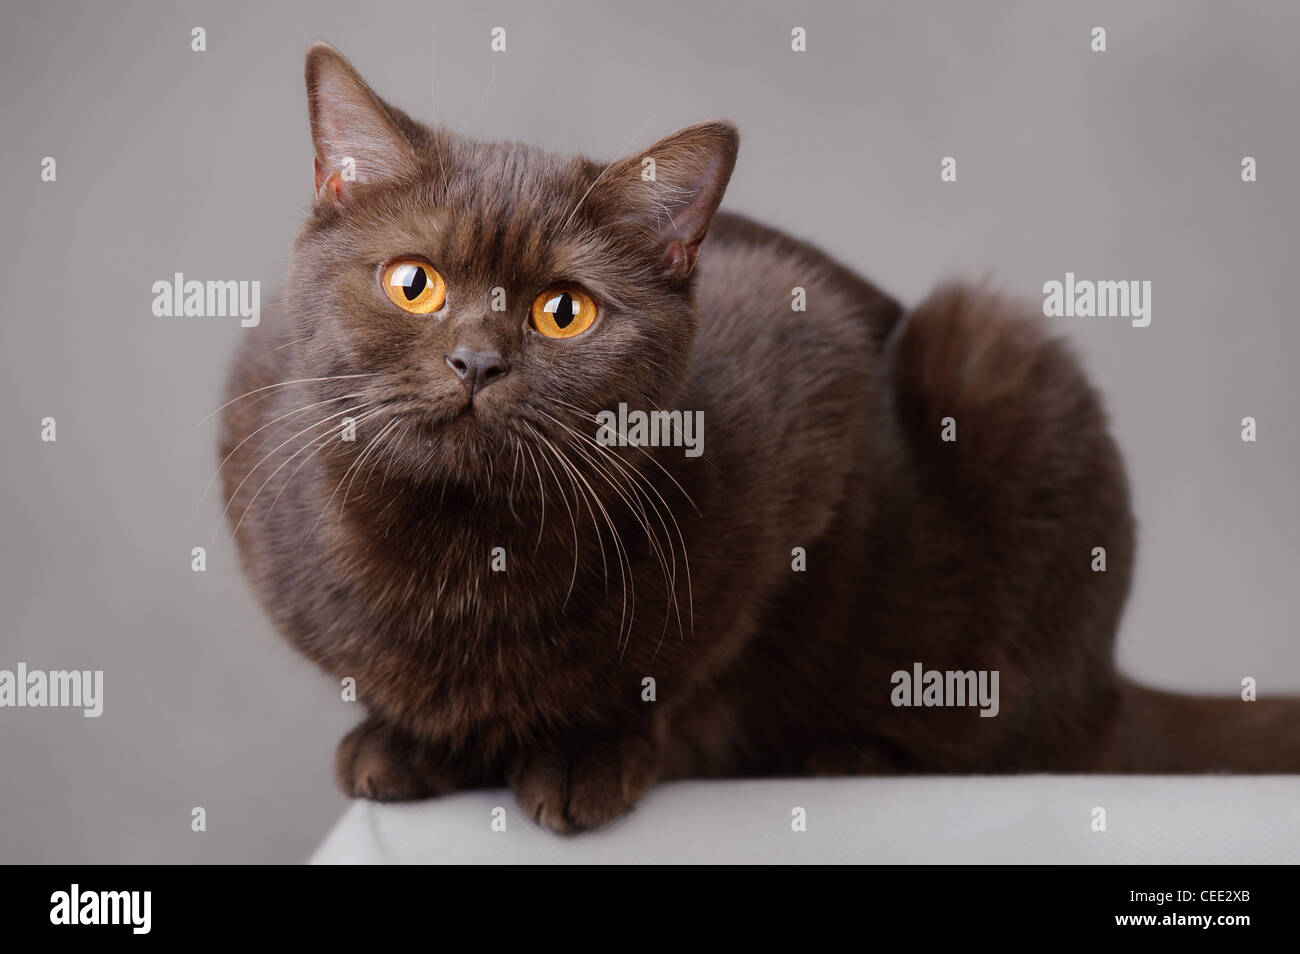 Chocolate British Shorthair Domestic Cat, Male Stock Photo ...